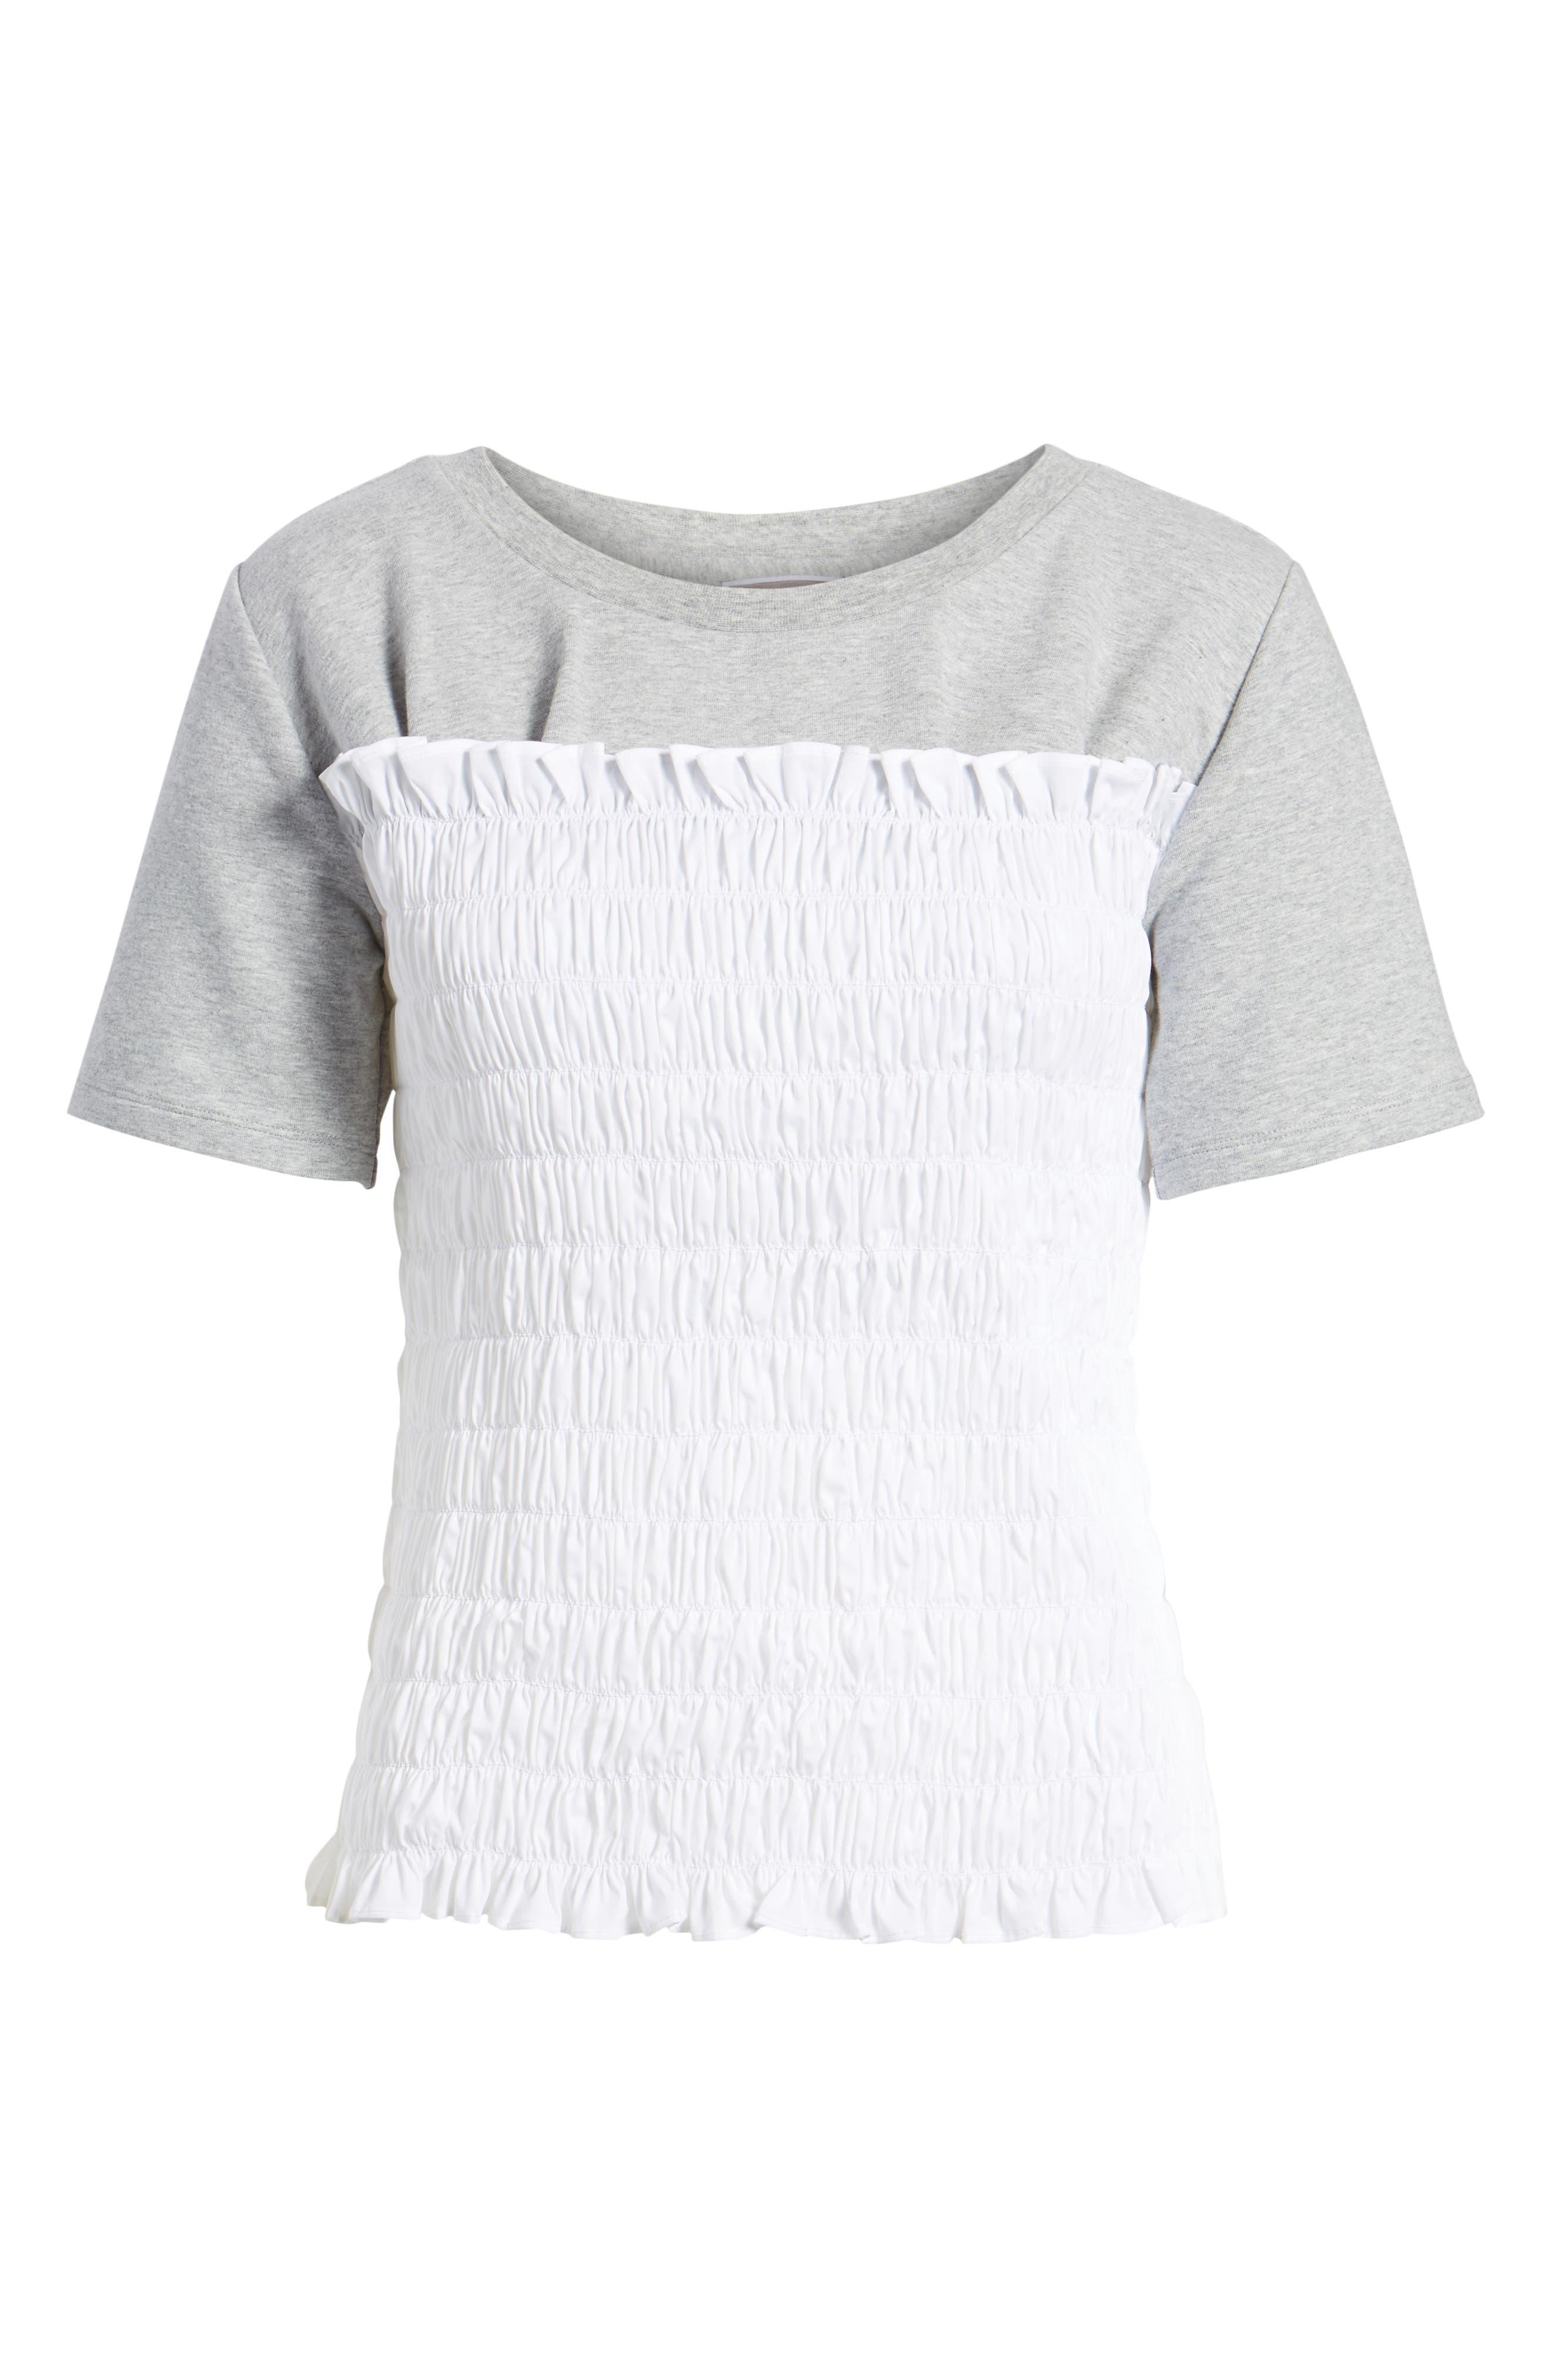 Smocked Sweatshirt,                             Alternate thumbnail 6, color,                             030